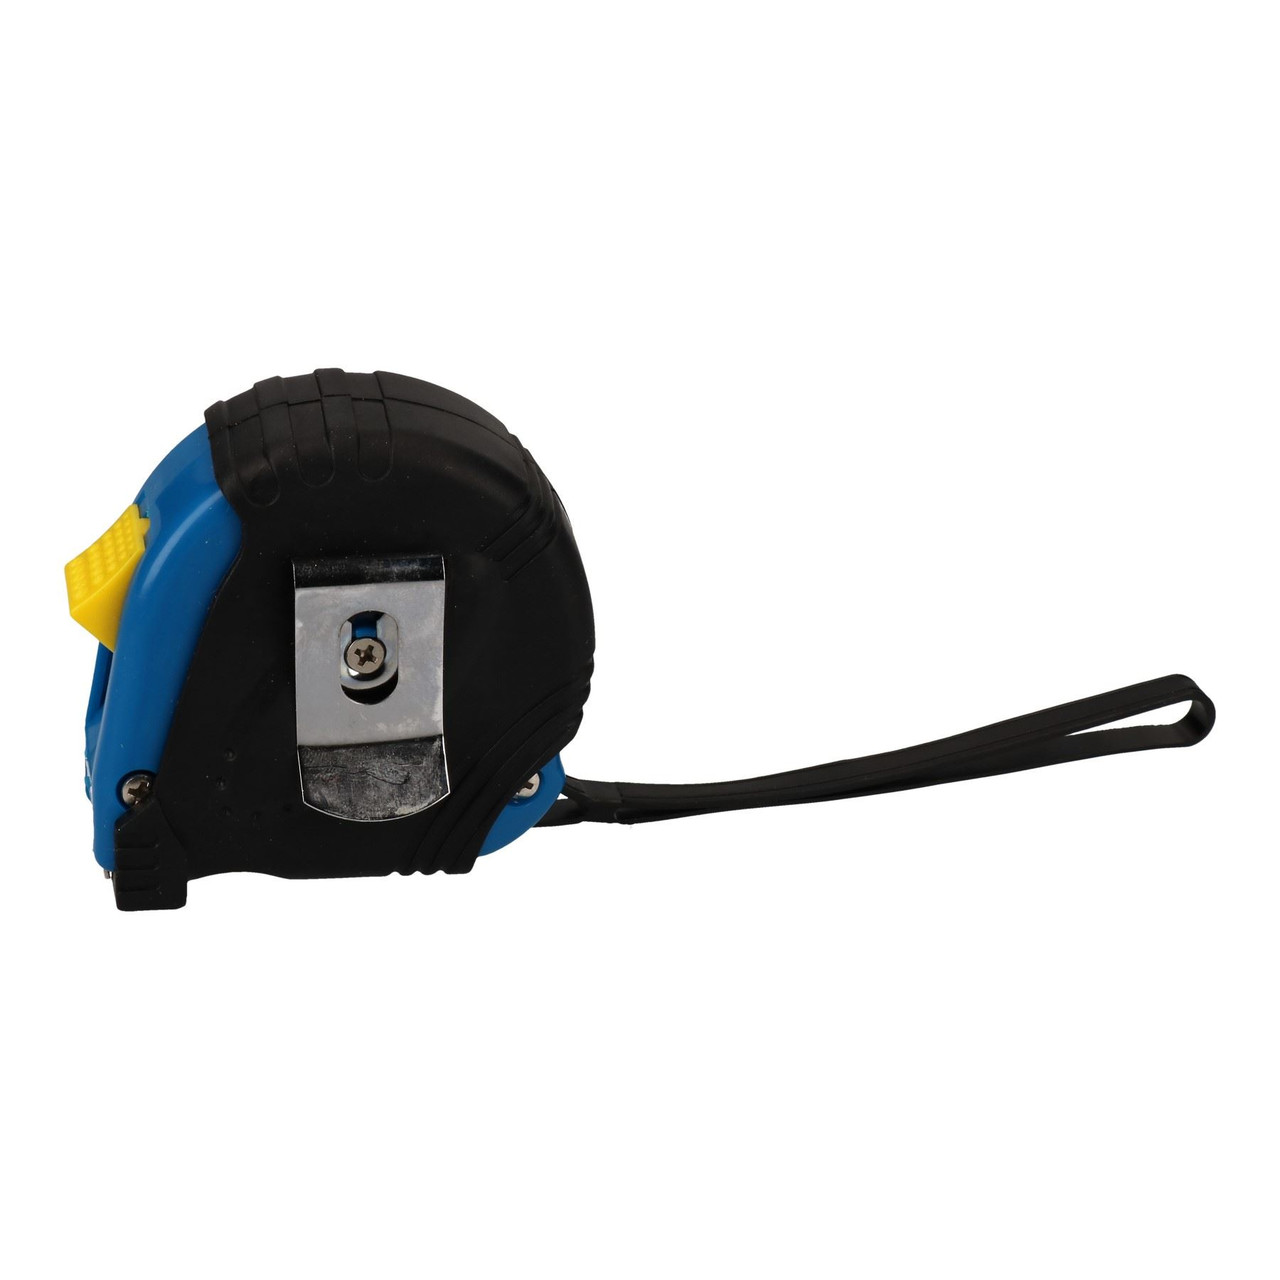 10 Metre Tape Measure Measuring Tools Metric Imperial Markings 5 4pc 3 7.5